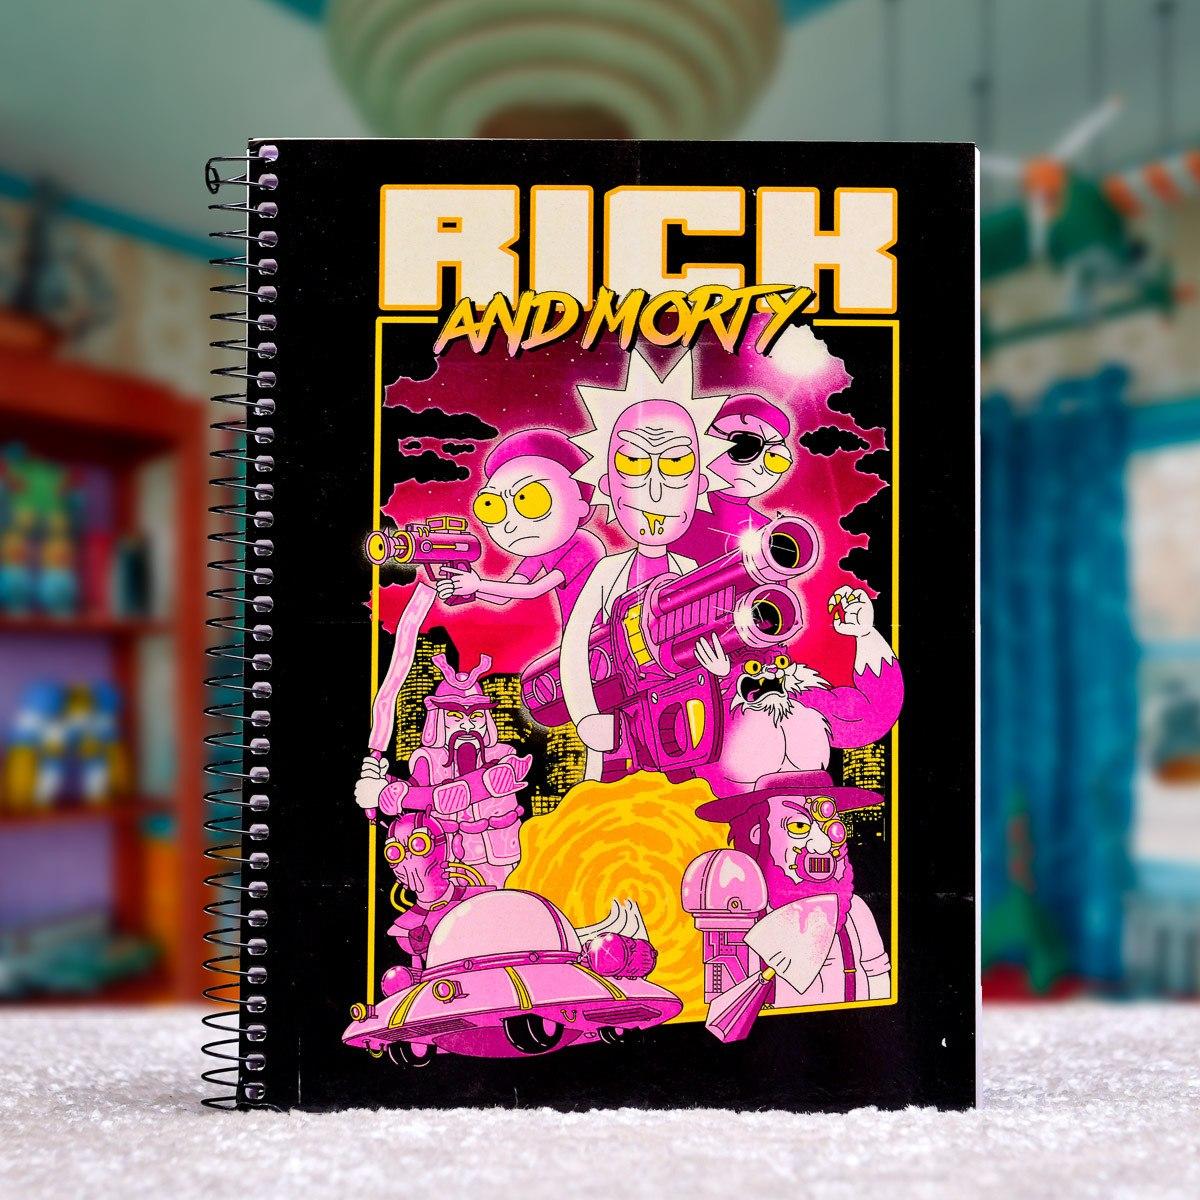 Rick & Morty Kidboxeo XXL